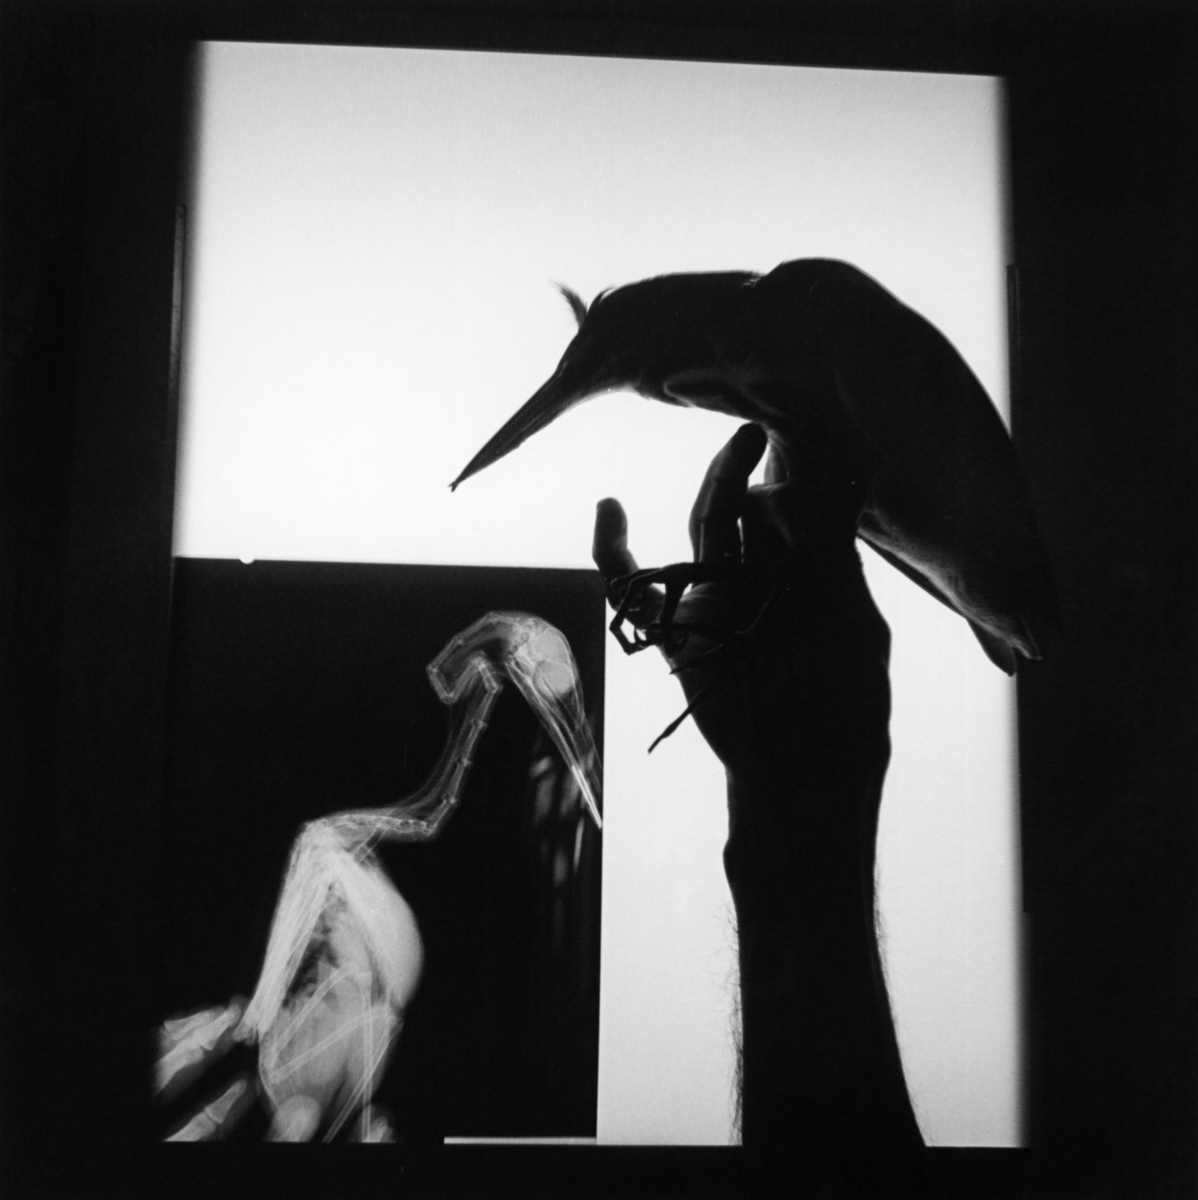 Iturbide_Radiografía+de+un+pájaro,+Oaxaca,+1999.jpg